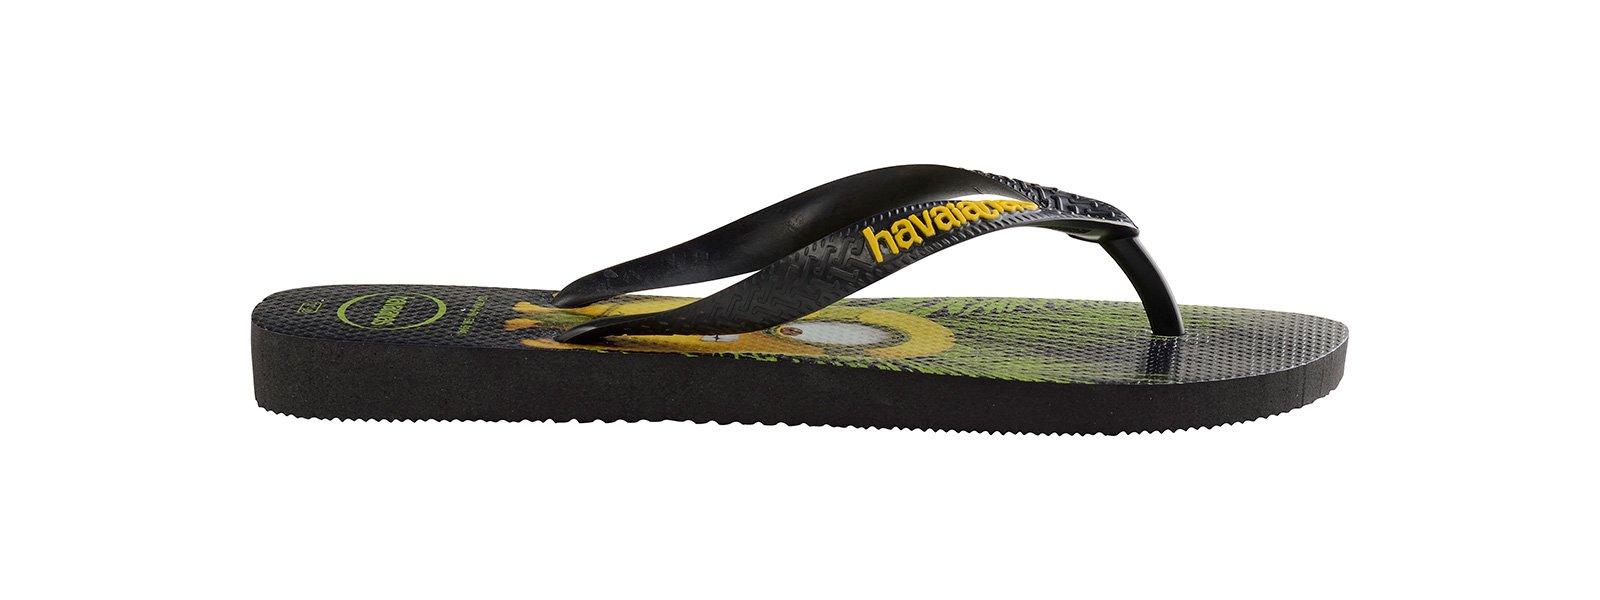 849090ba6 Flip-Flops Black Flip Flops - Havaianas Minions Black